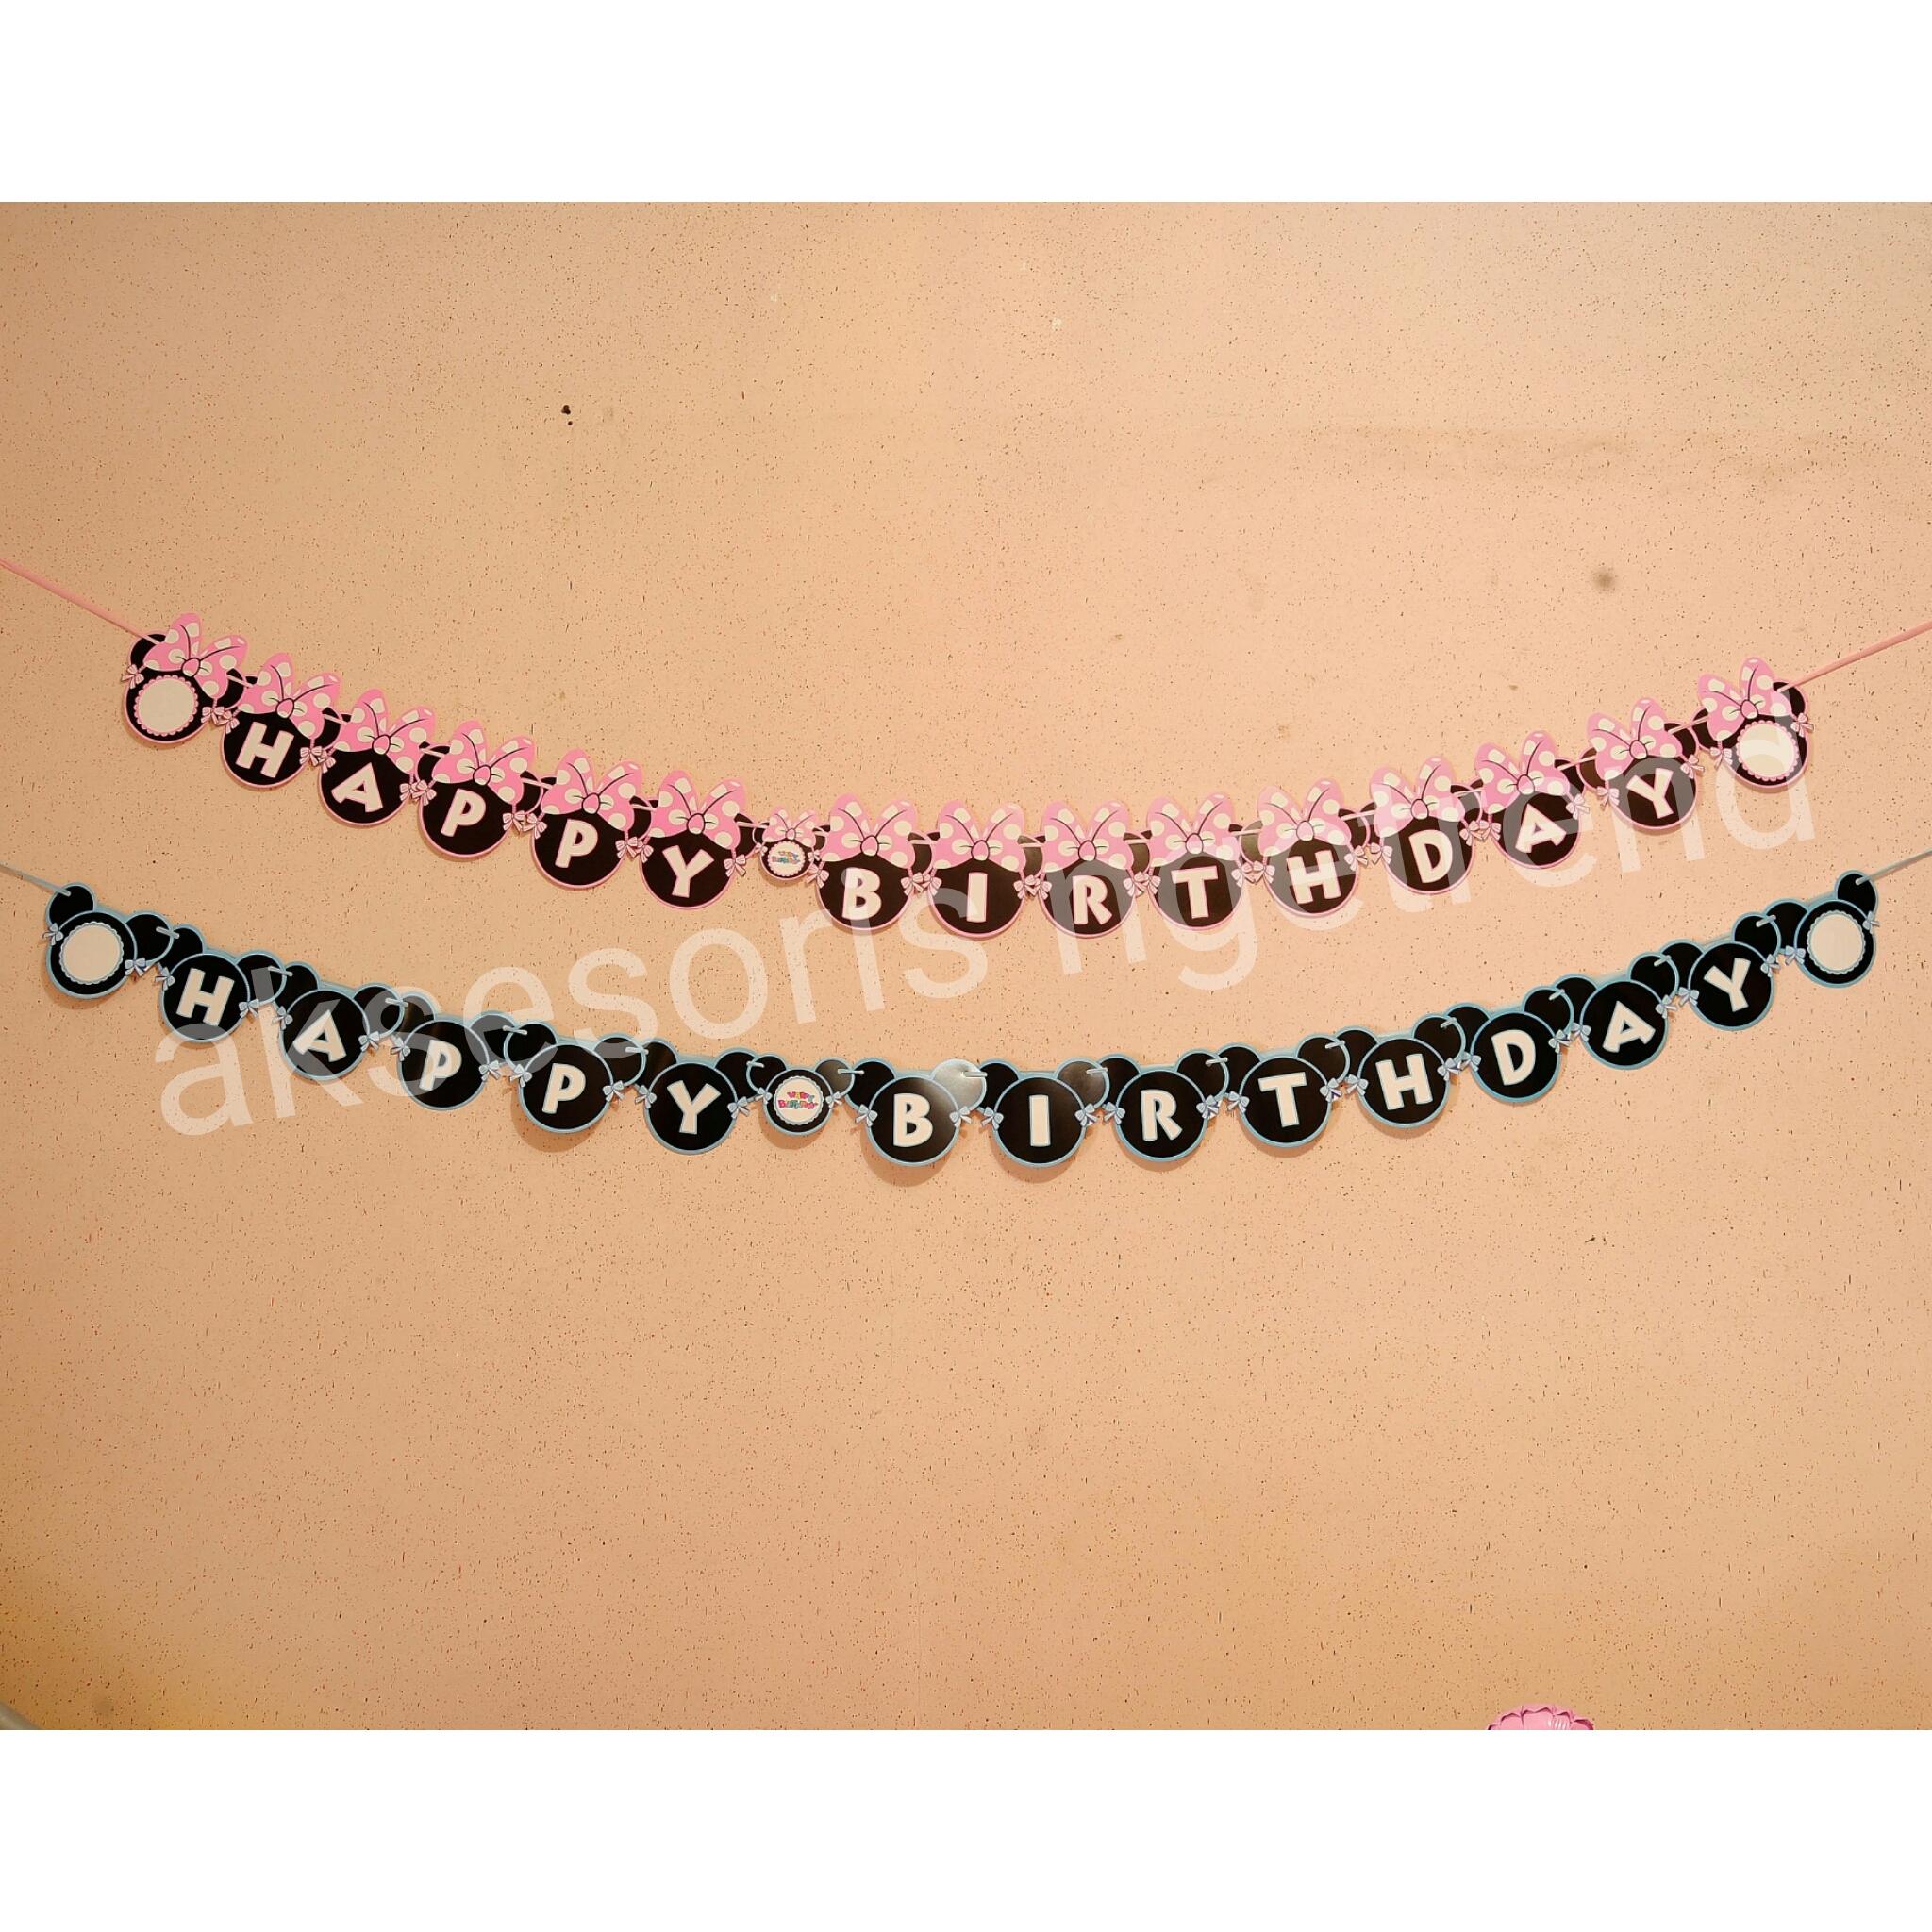 Jual Birthday Flag Mickey Minnie Dekorasi Pesta Ulang Tahun Balon Huruf Pink Aksesoris Ngetrend Tokopedia